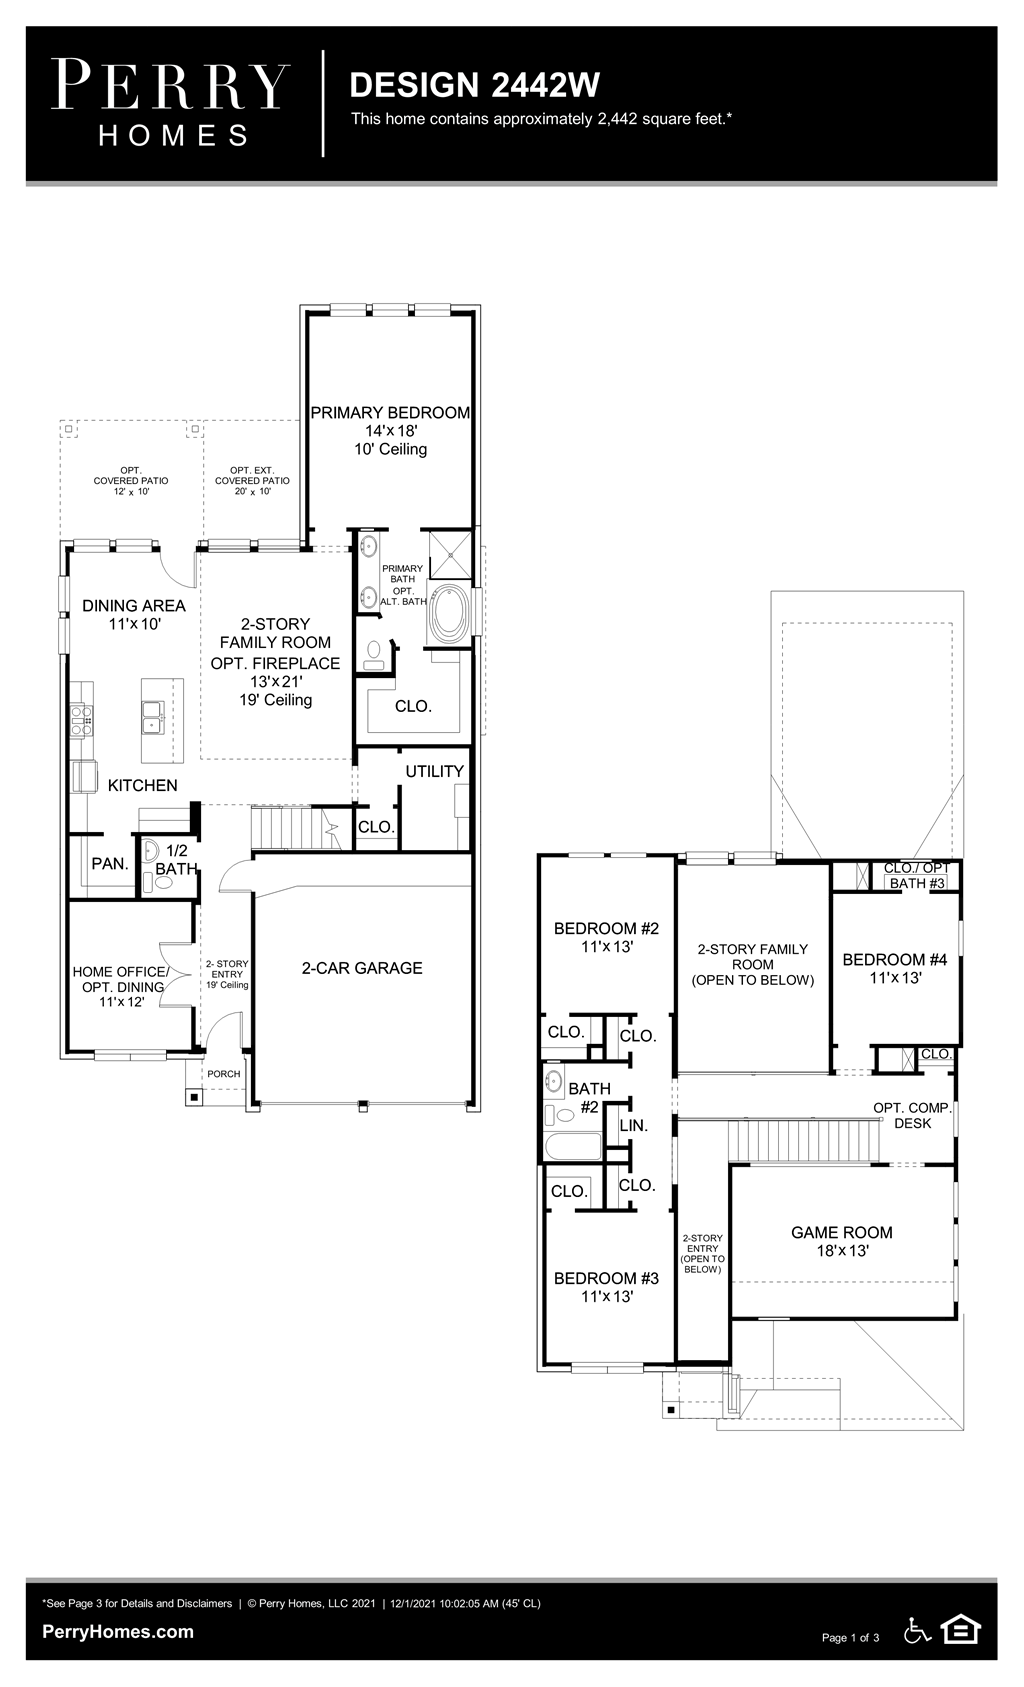 Floor Plan for 2442W